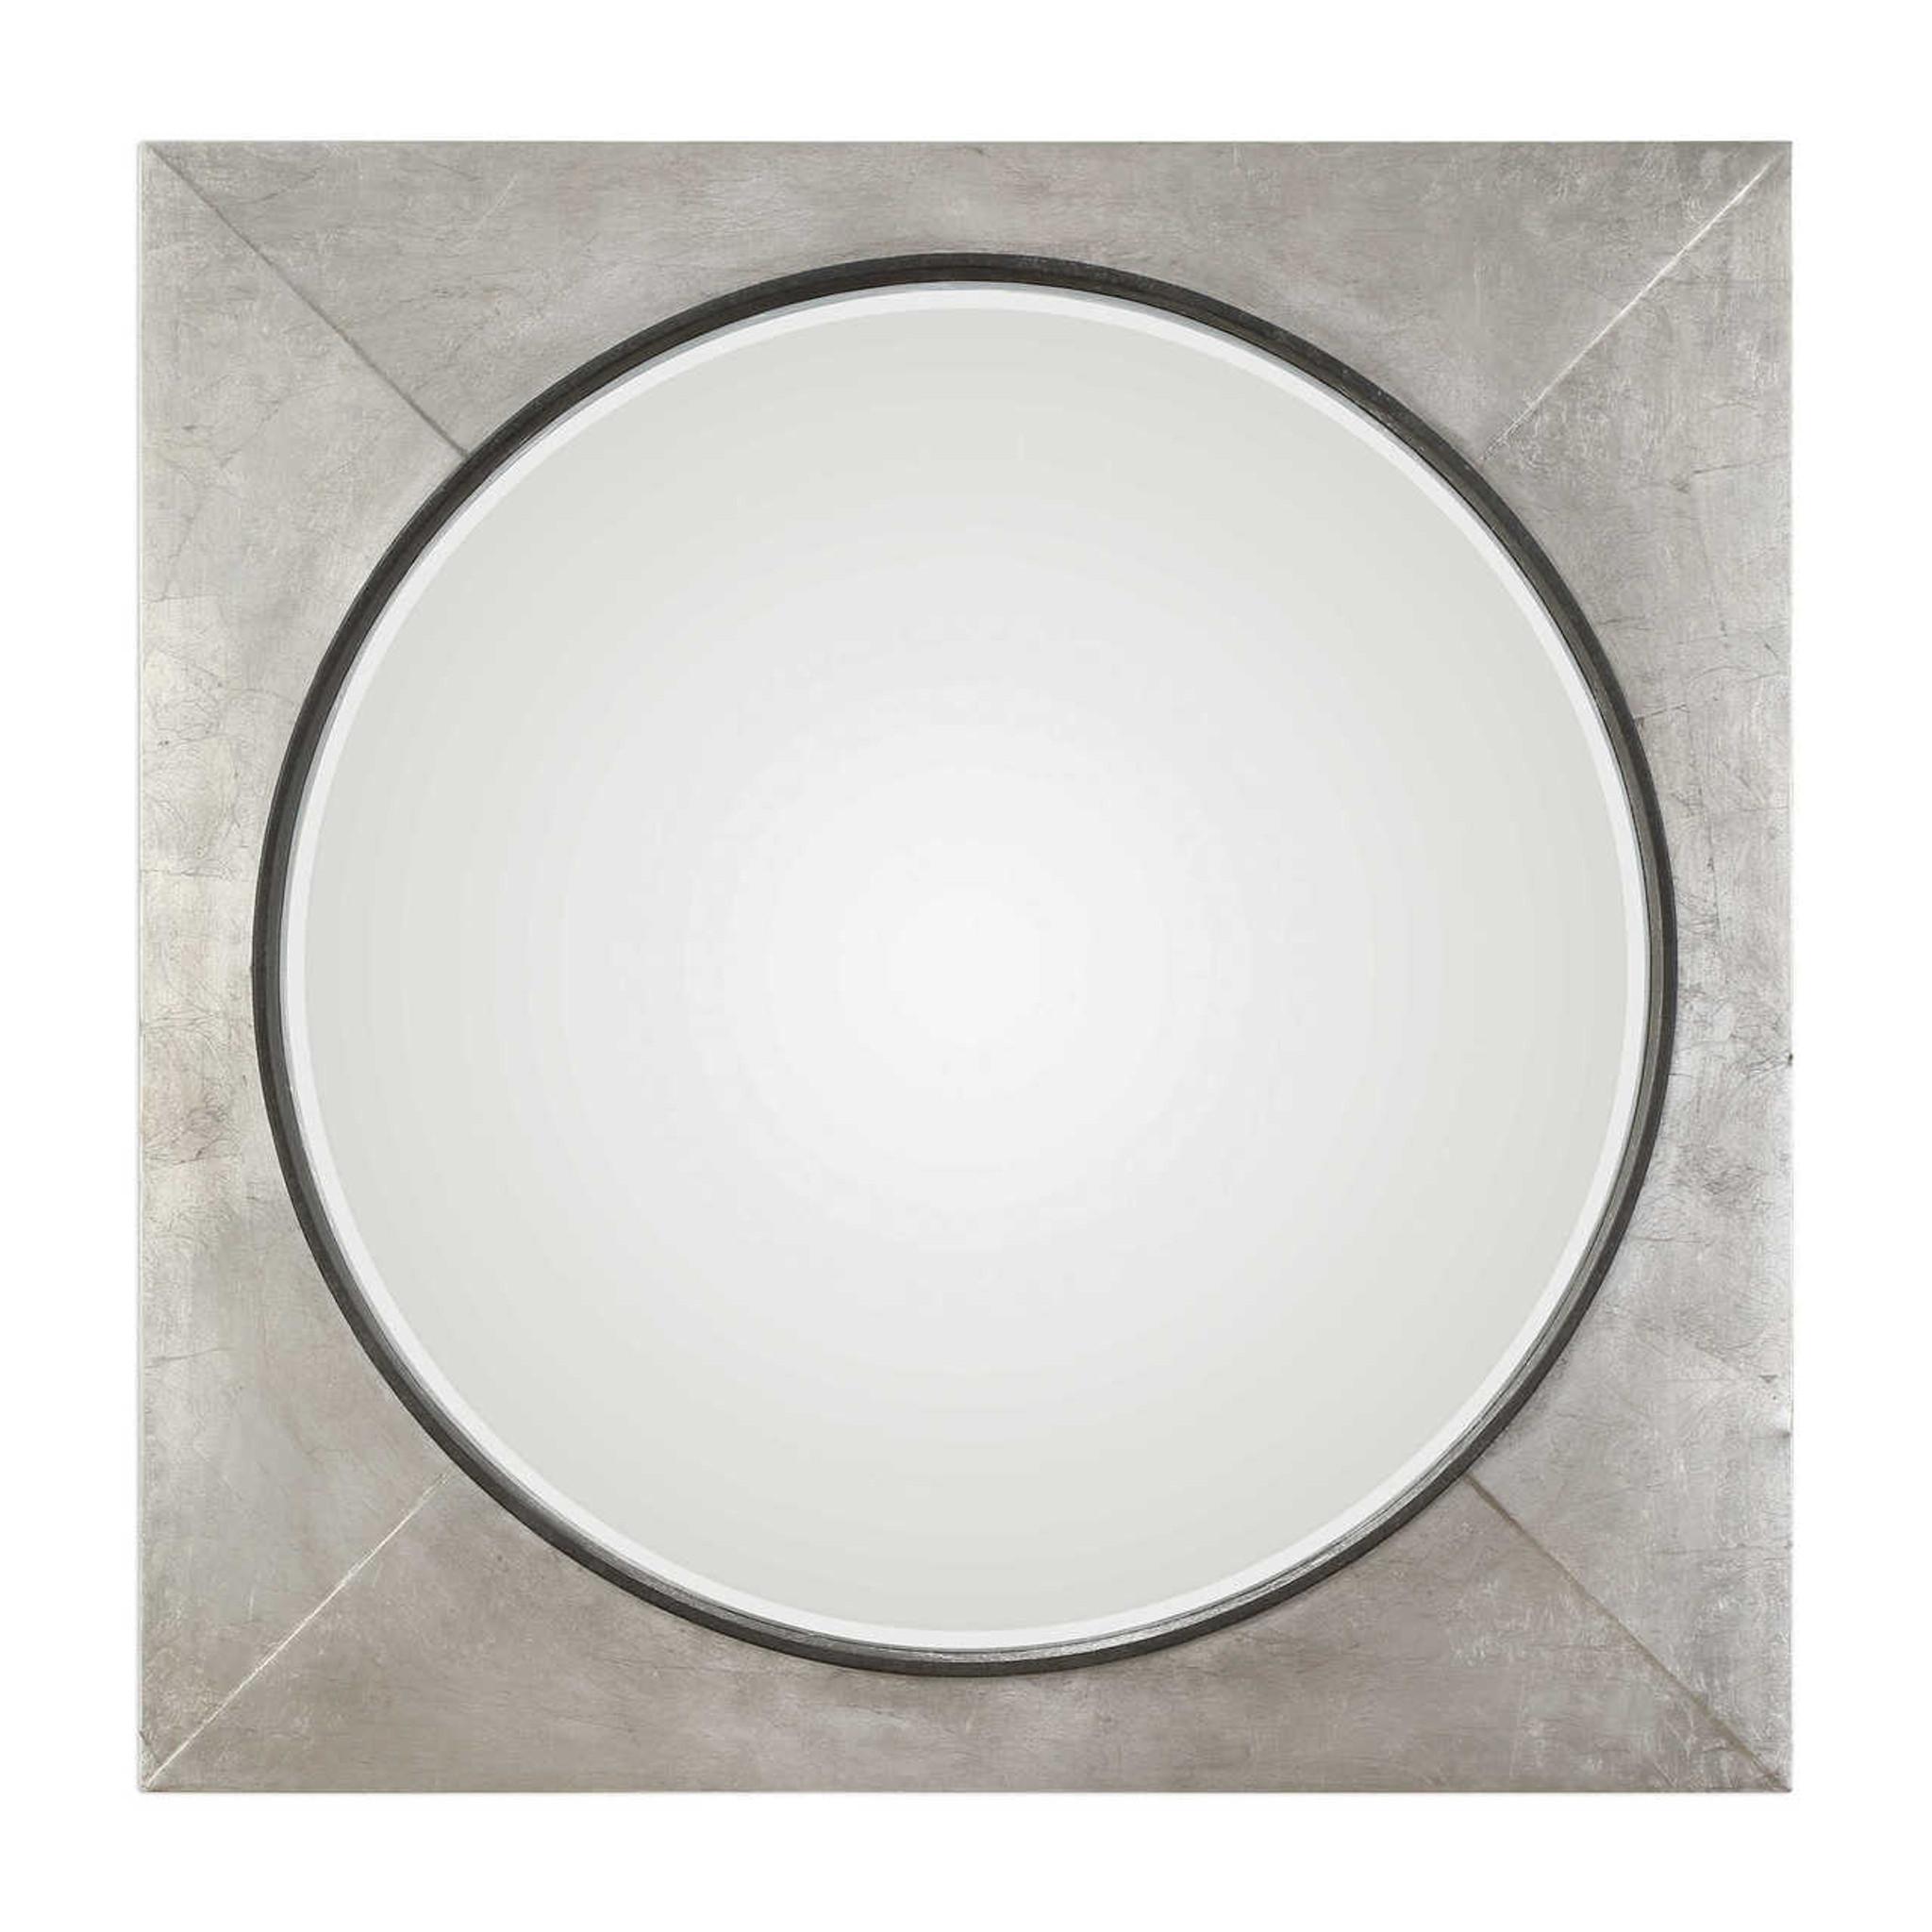 large square wall mirrors decorative silver tin industrial modern uttermost Solomon metallic silver